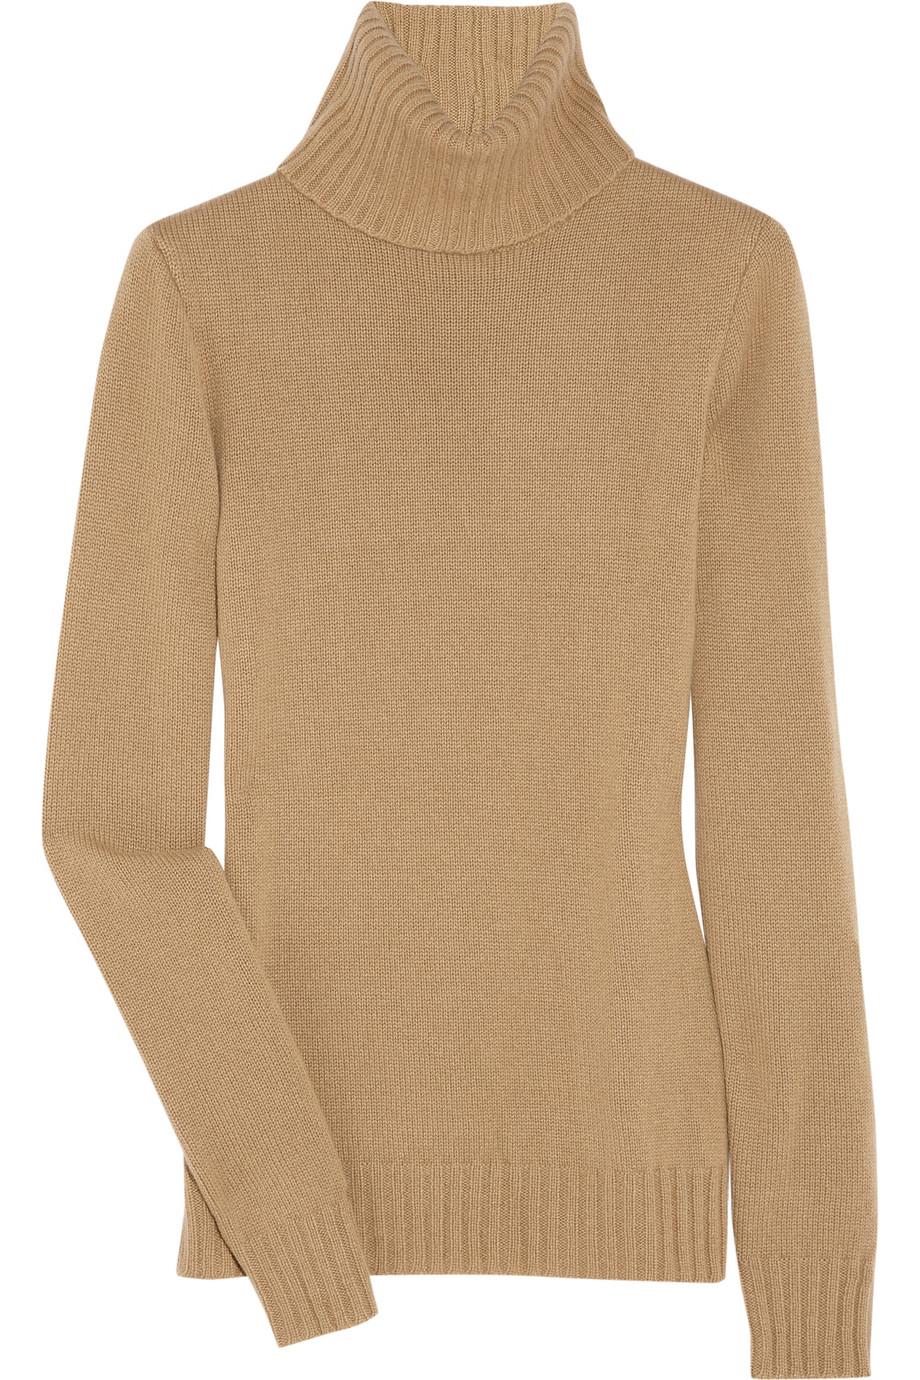 Ralph Lauren Collection Long Sleeve Cashmere Turtleneck In